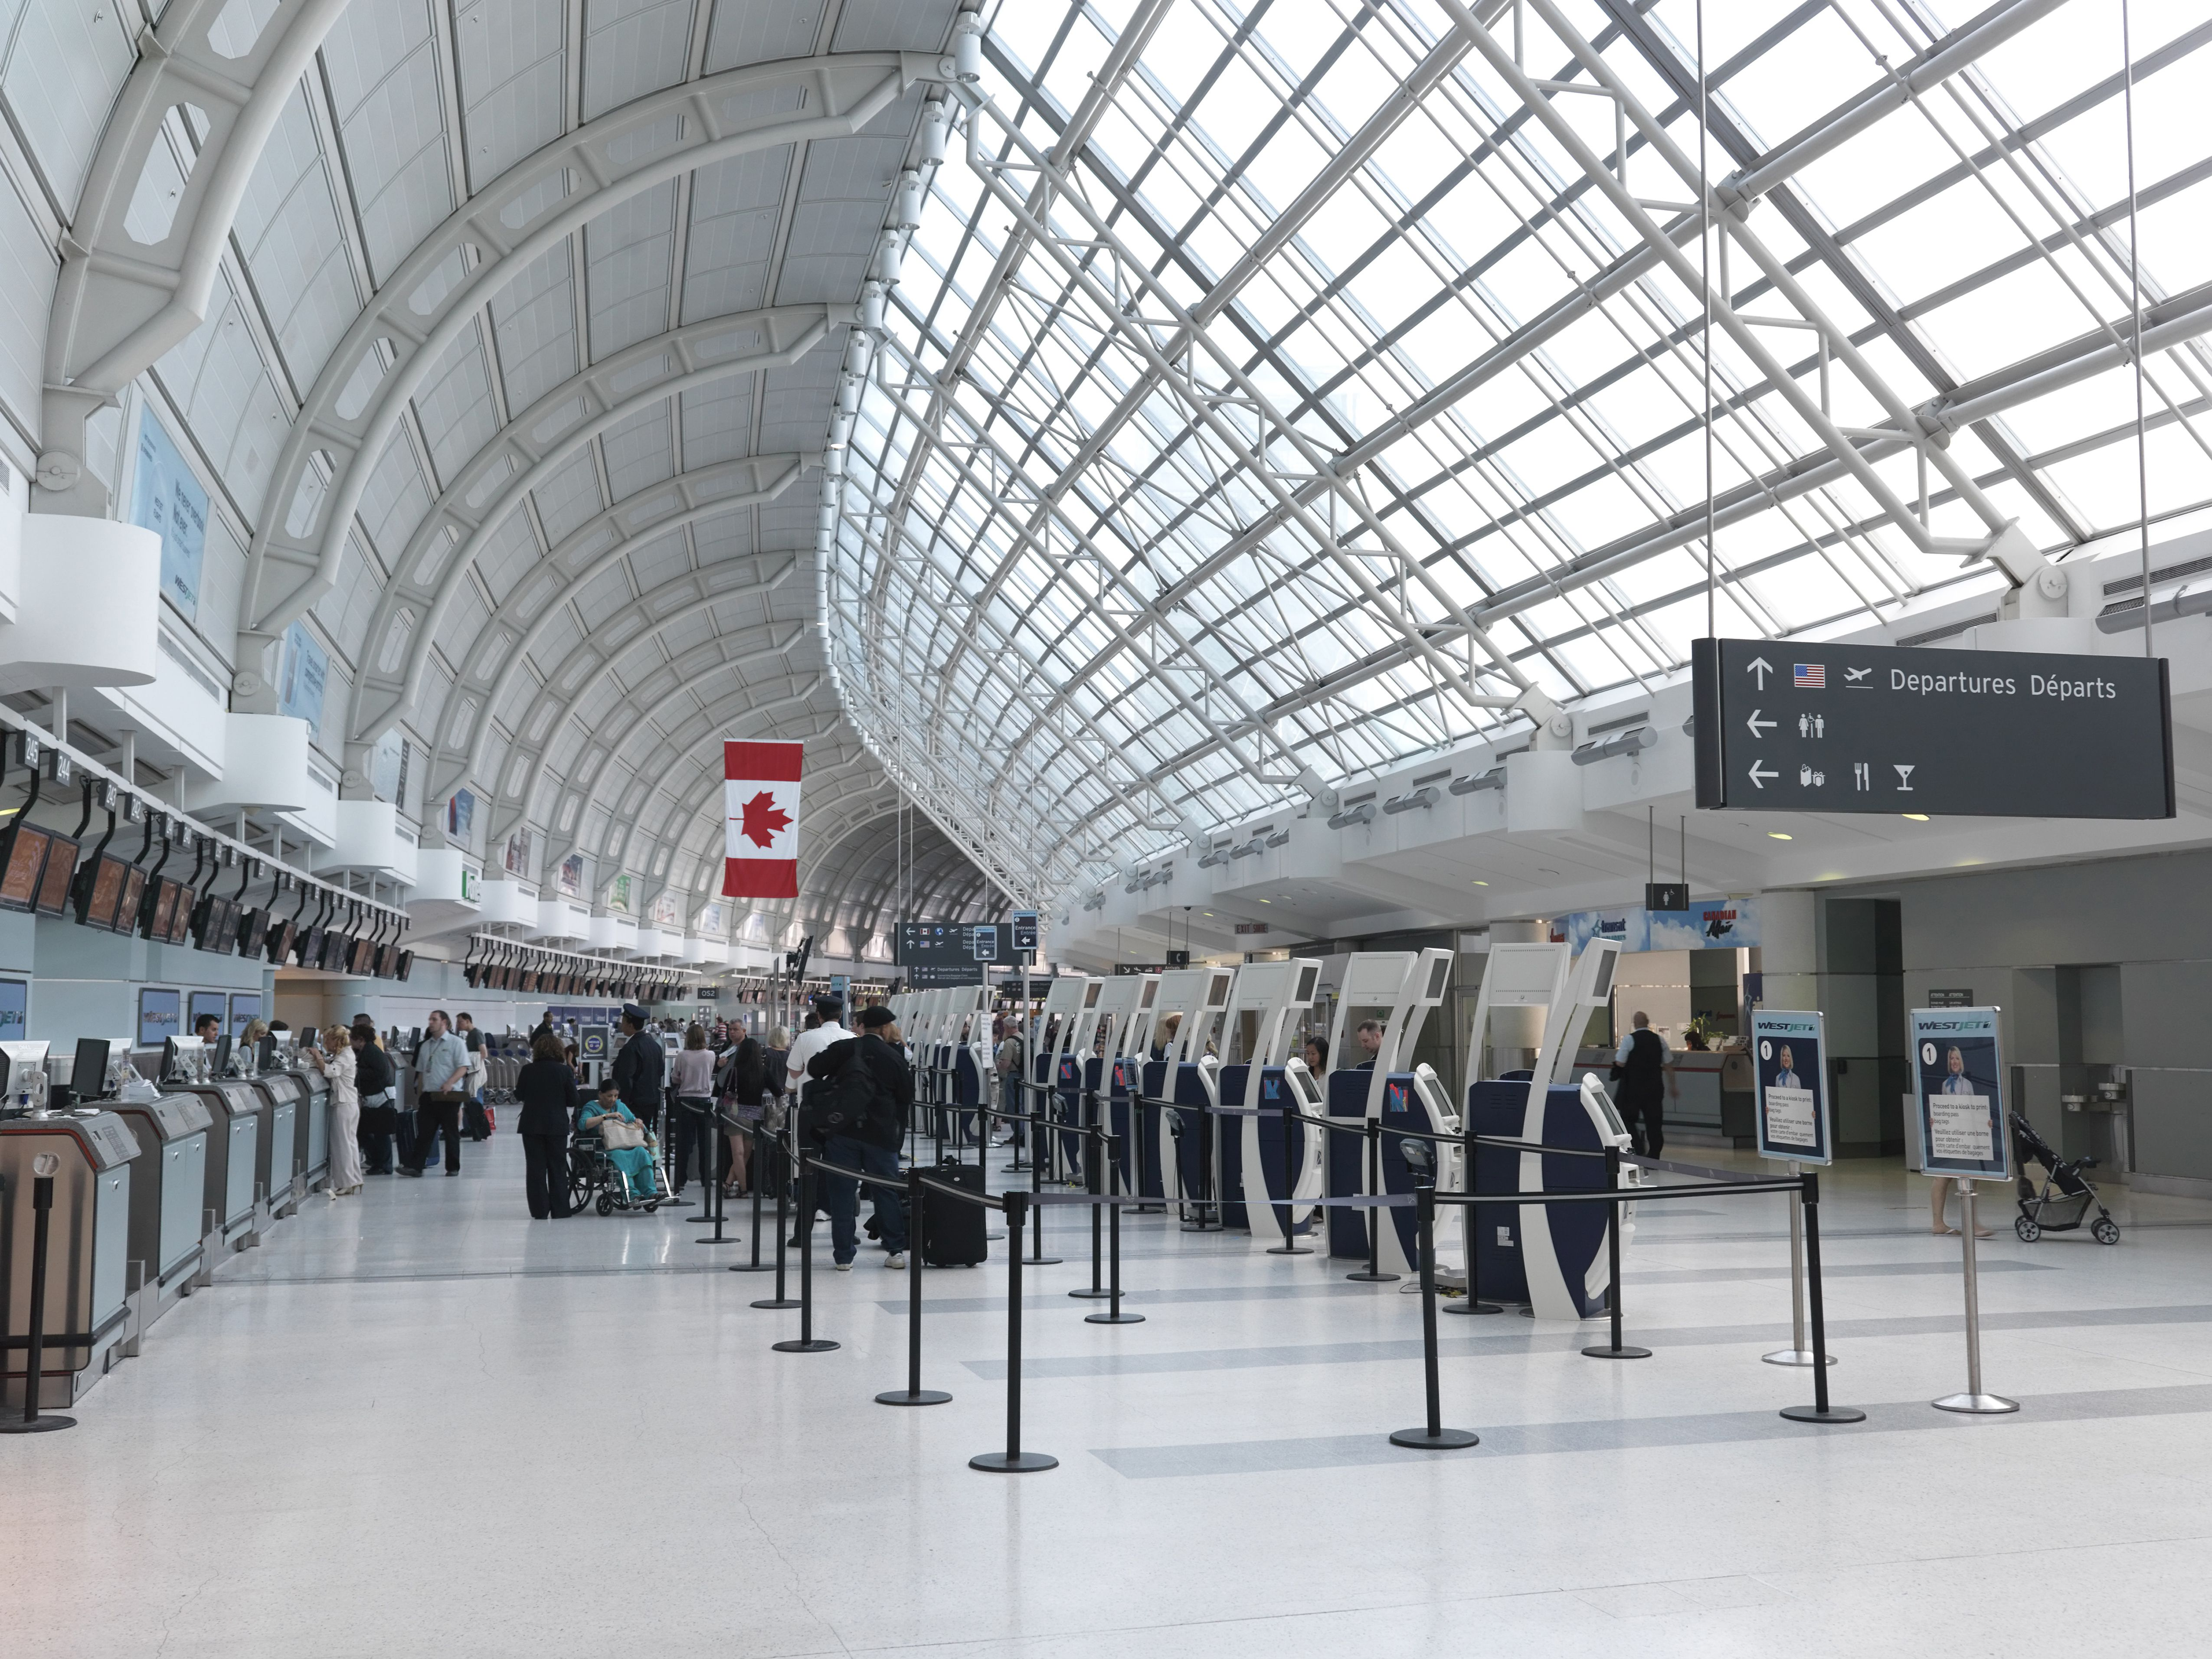 Getting to Toronto Pearson International Airport